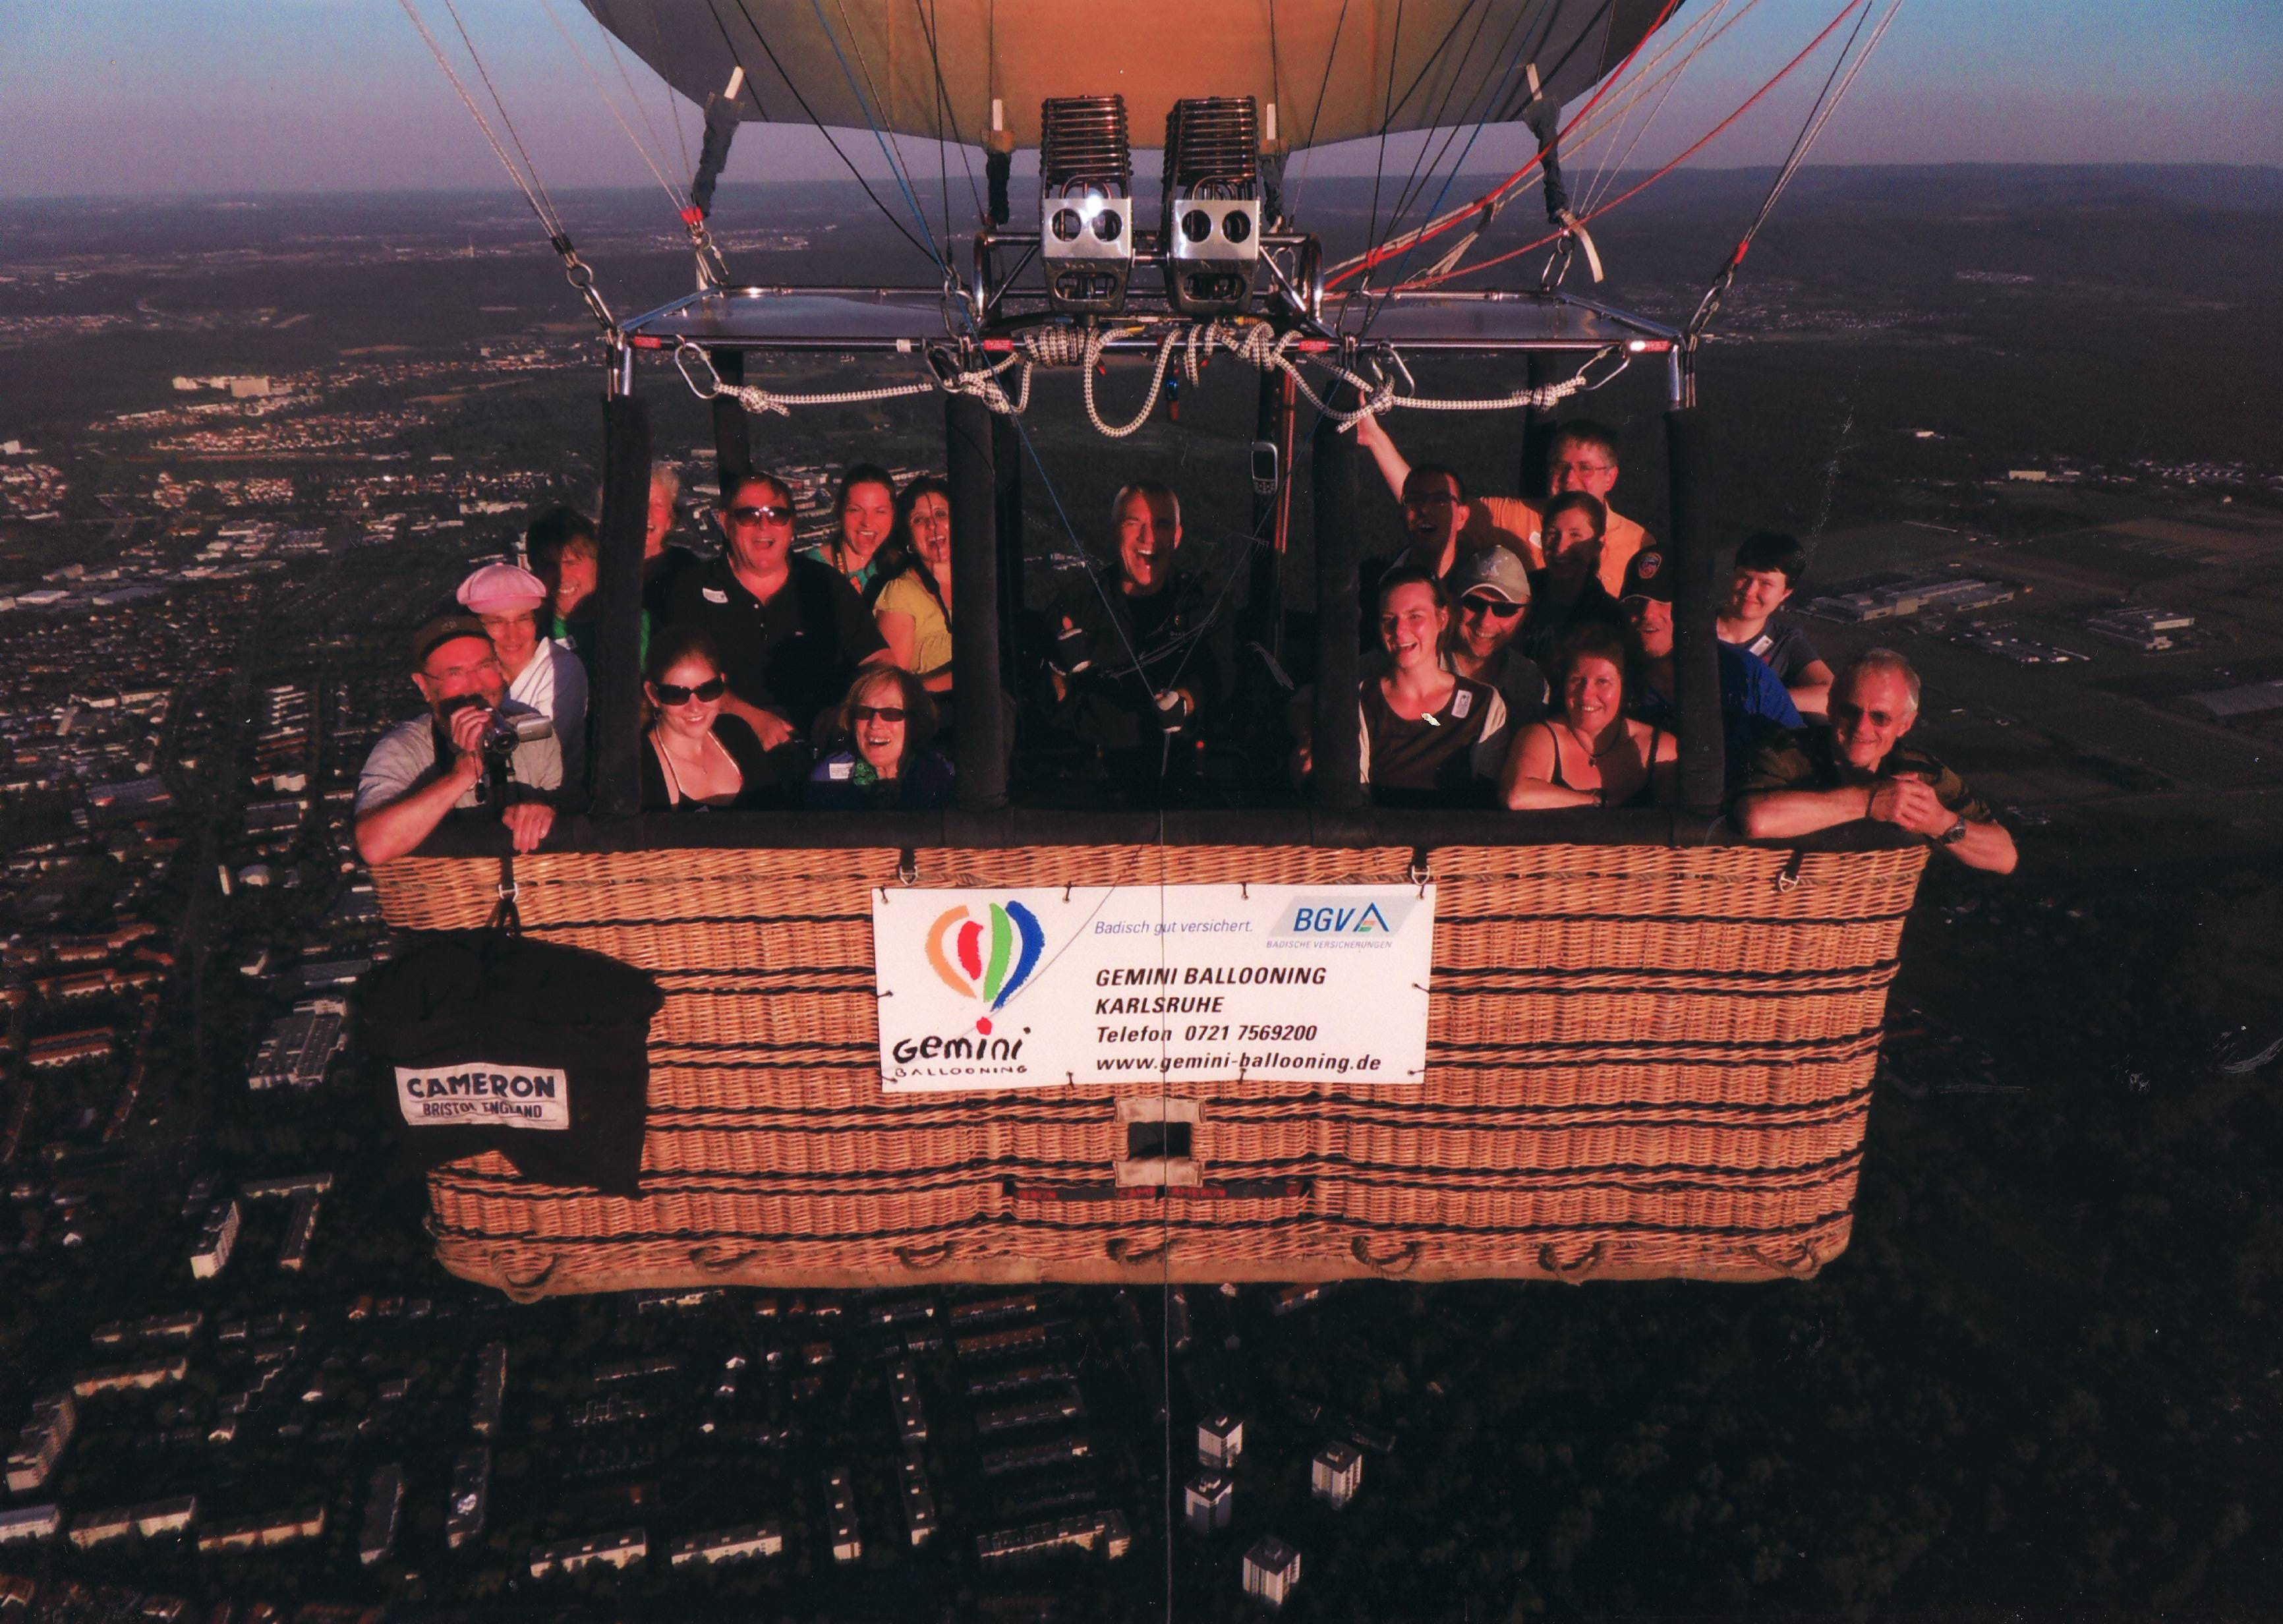 Ballonfahrt23072012KAGemini